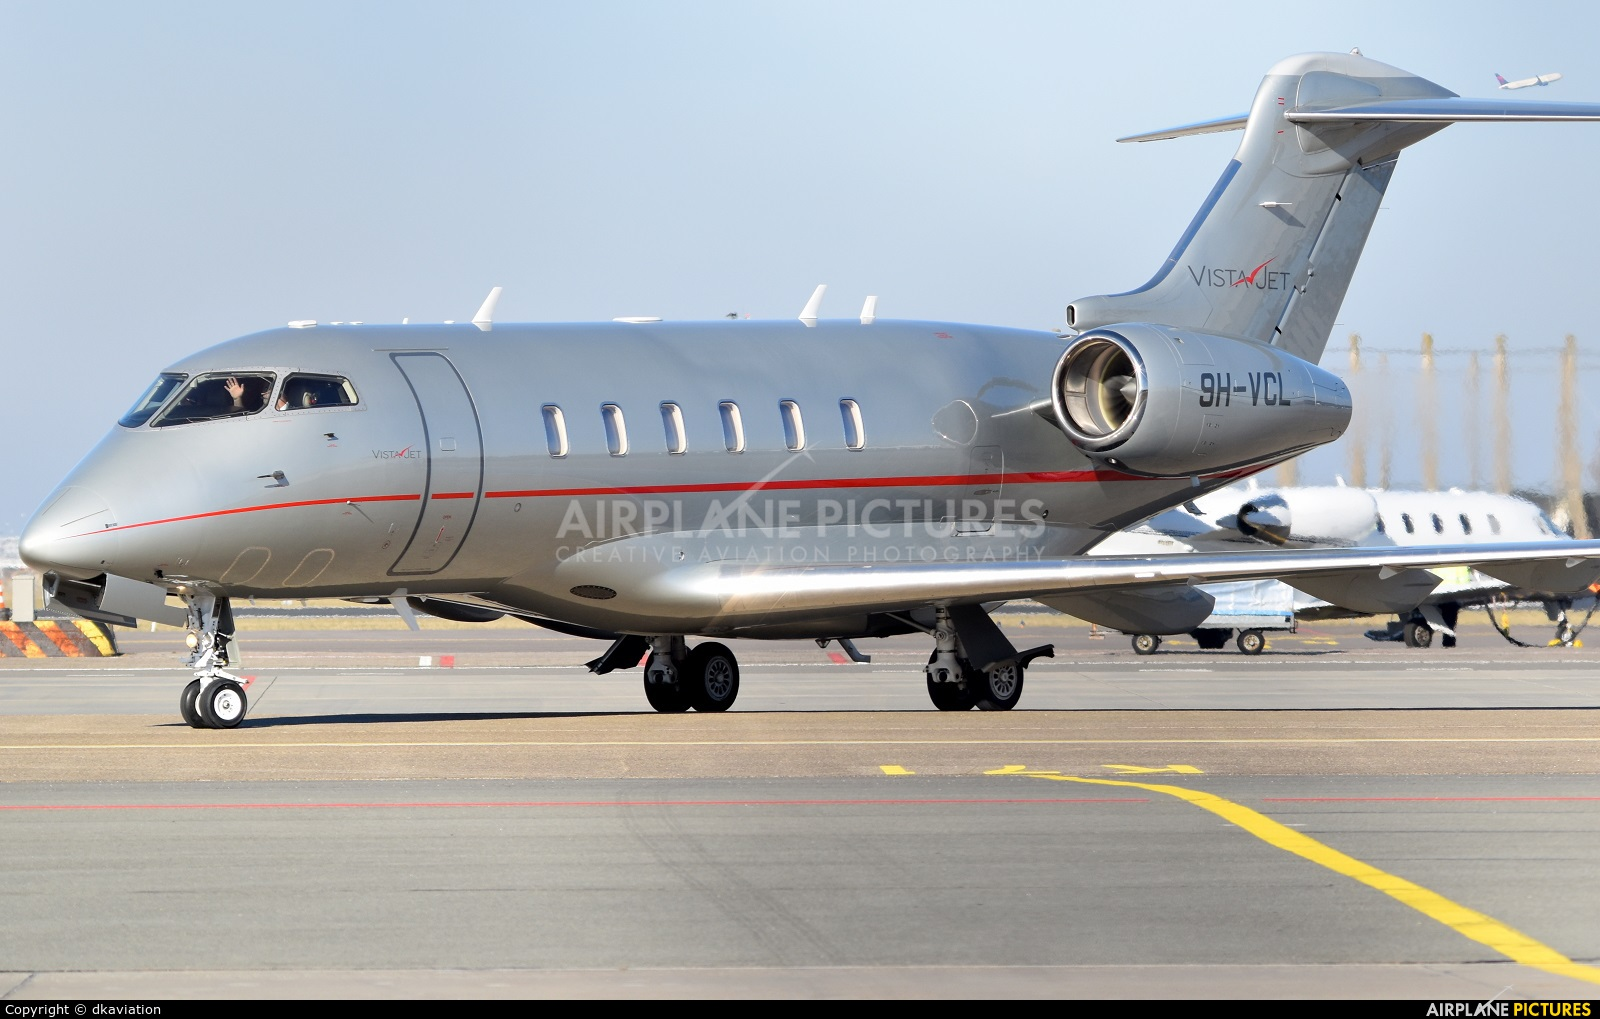 Vistajet 9H-VCL aircraft at Amsterdam - Schiphol